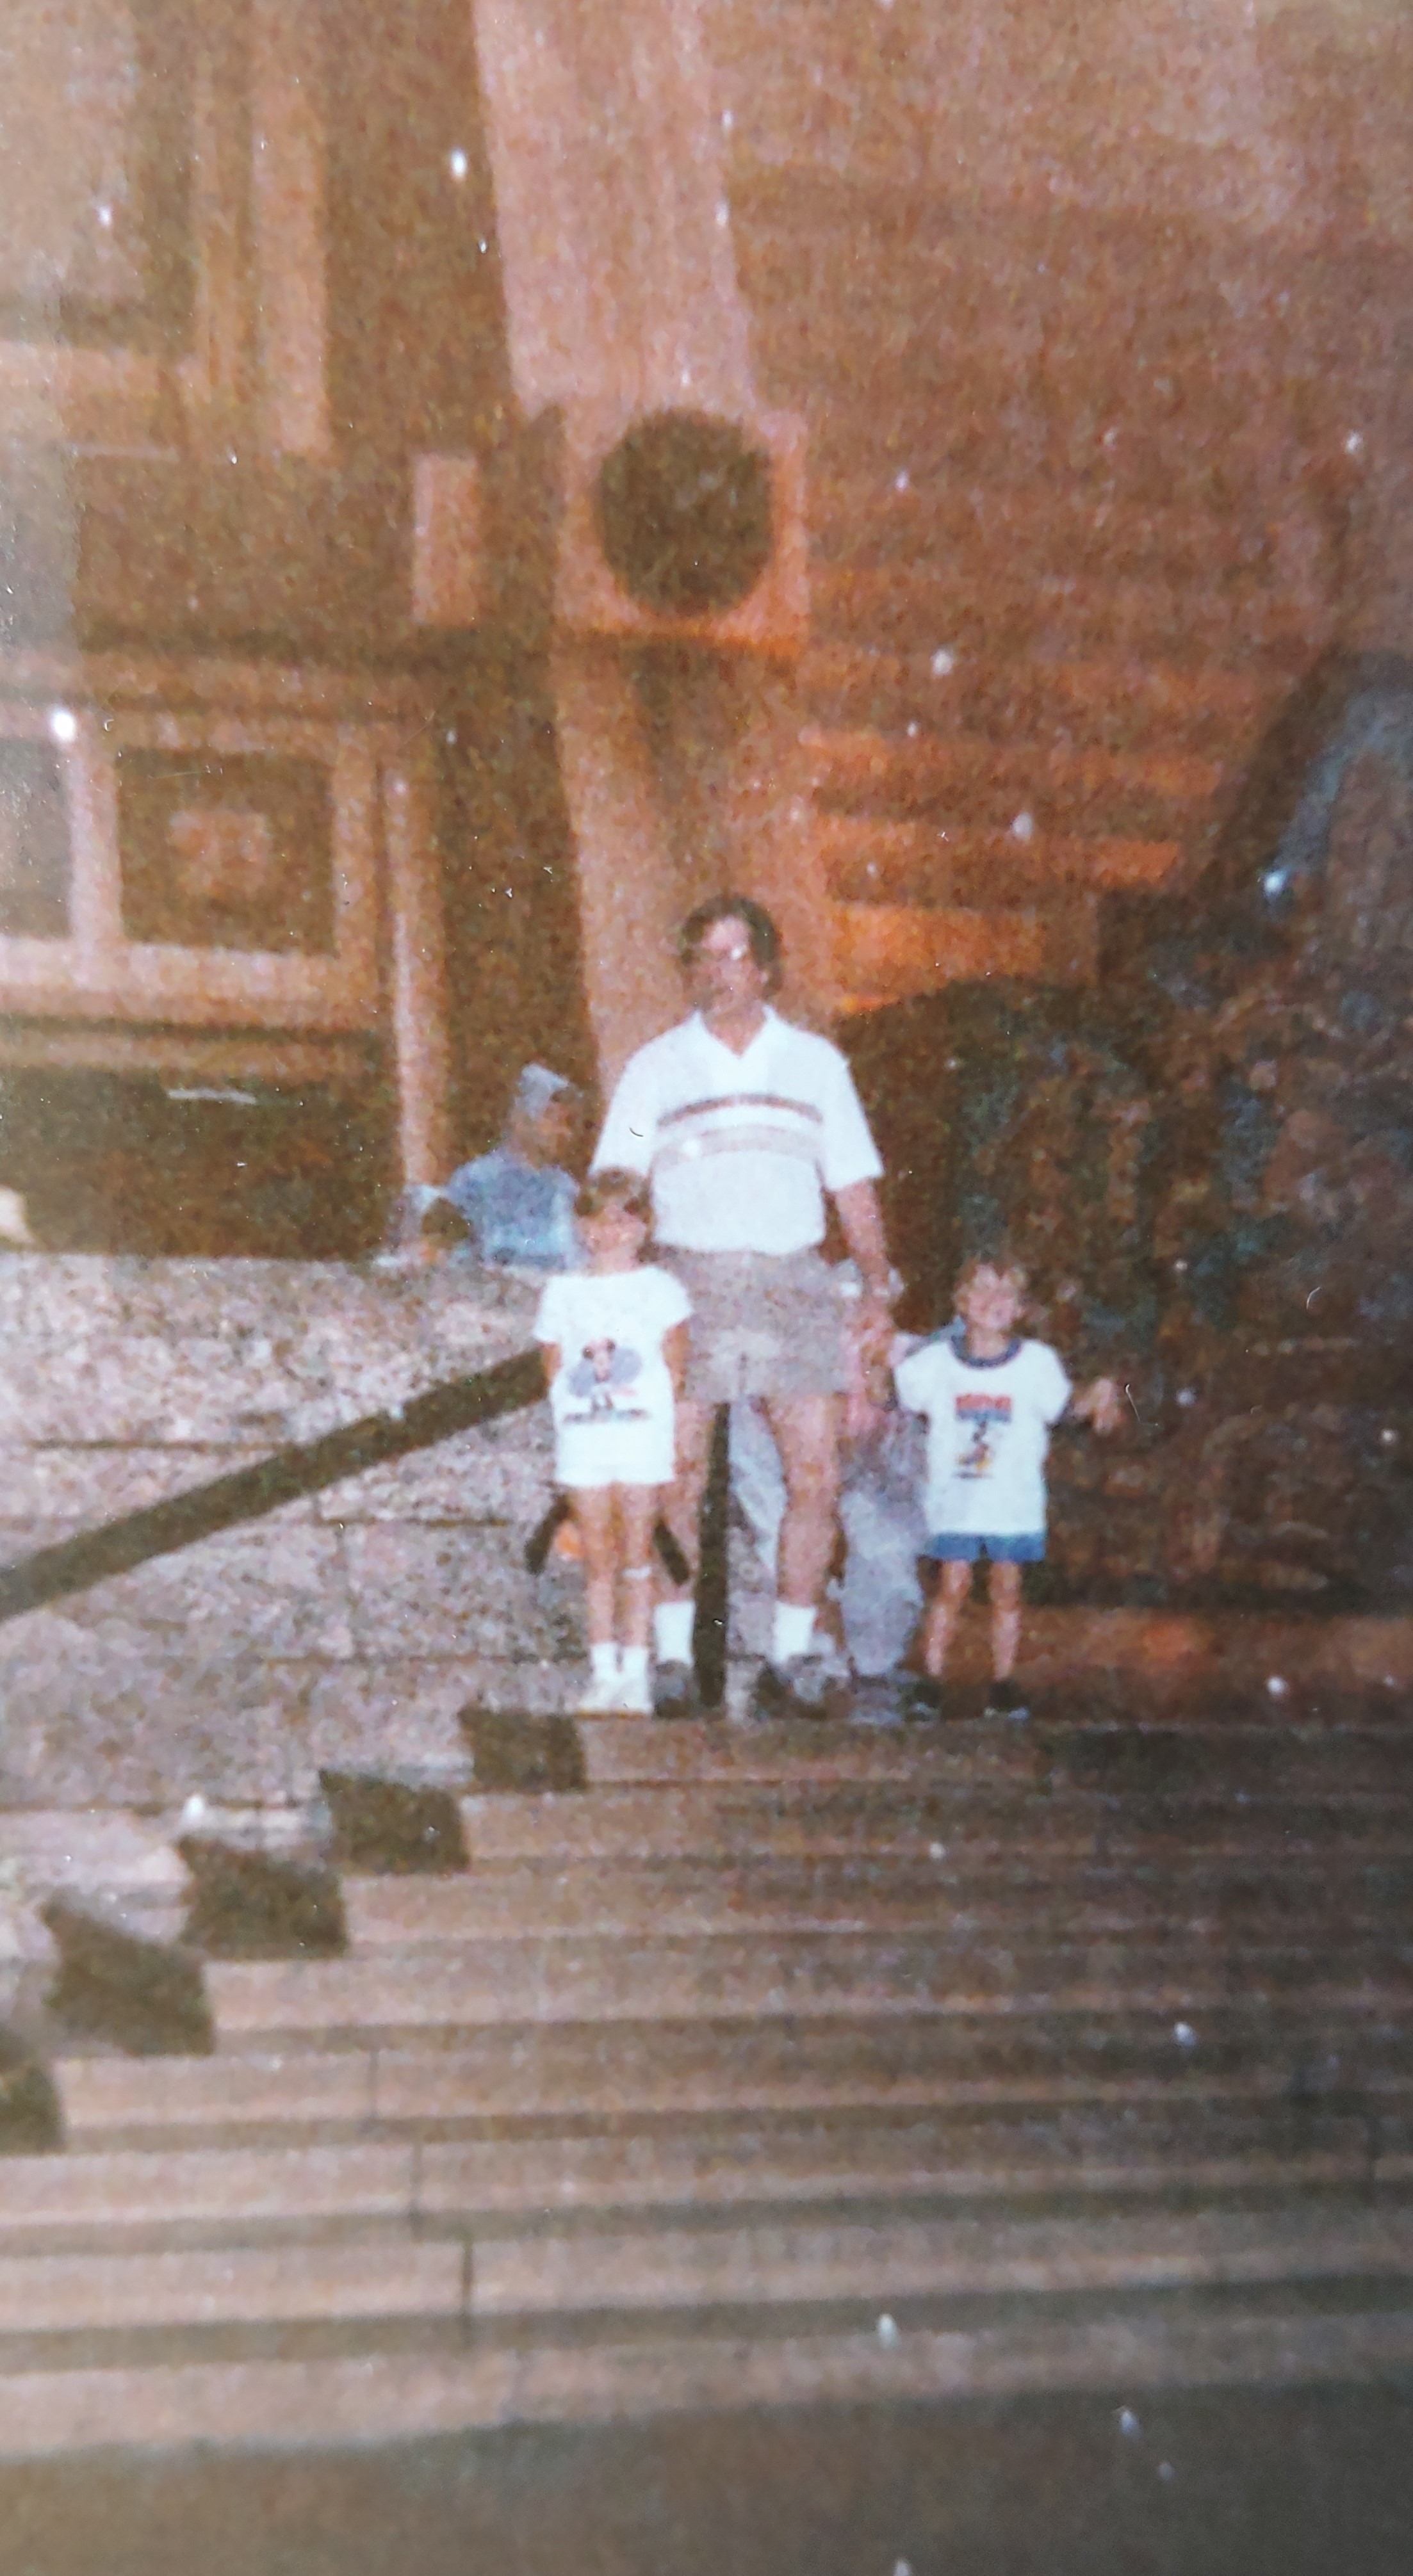 randy and kids at disney in rain.jpg